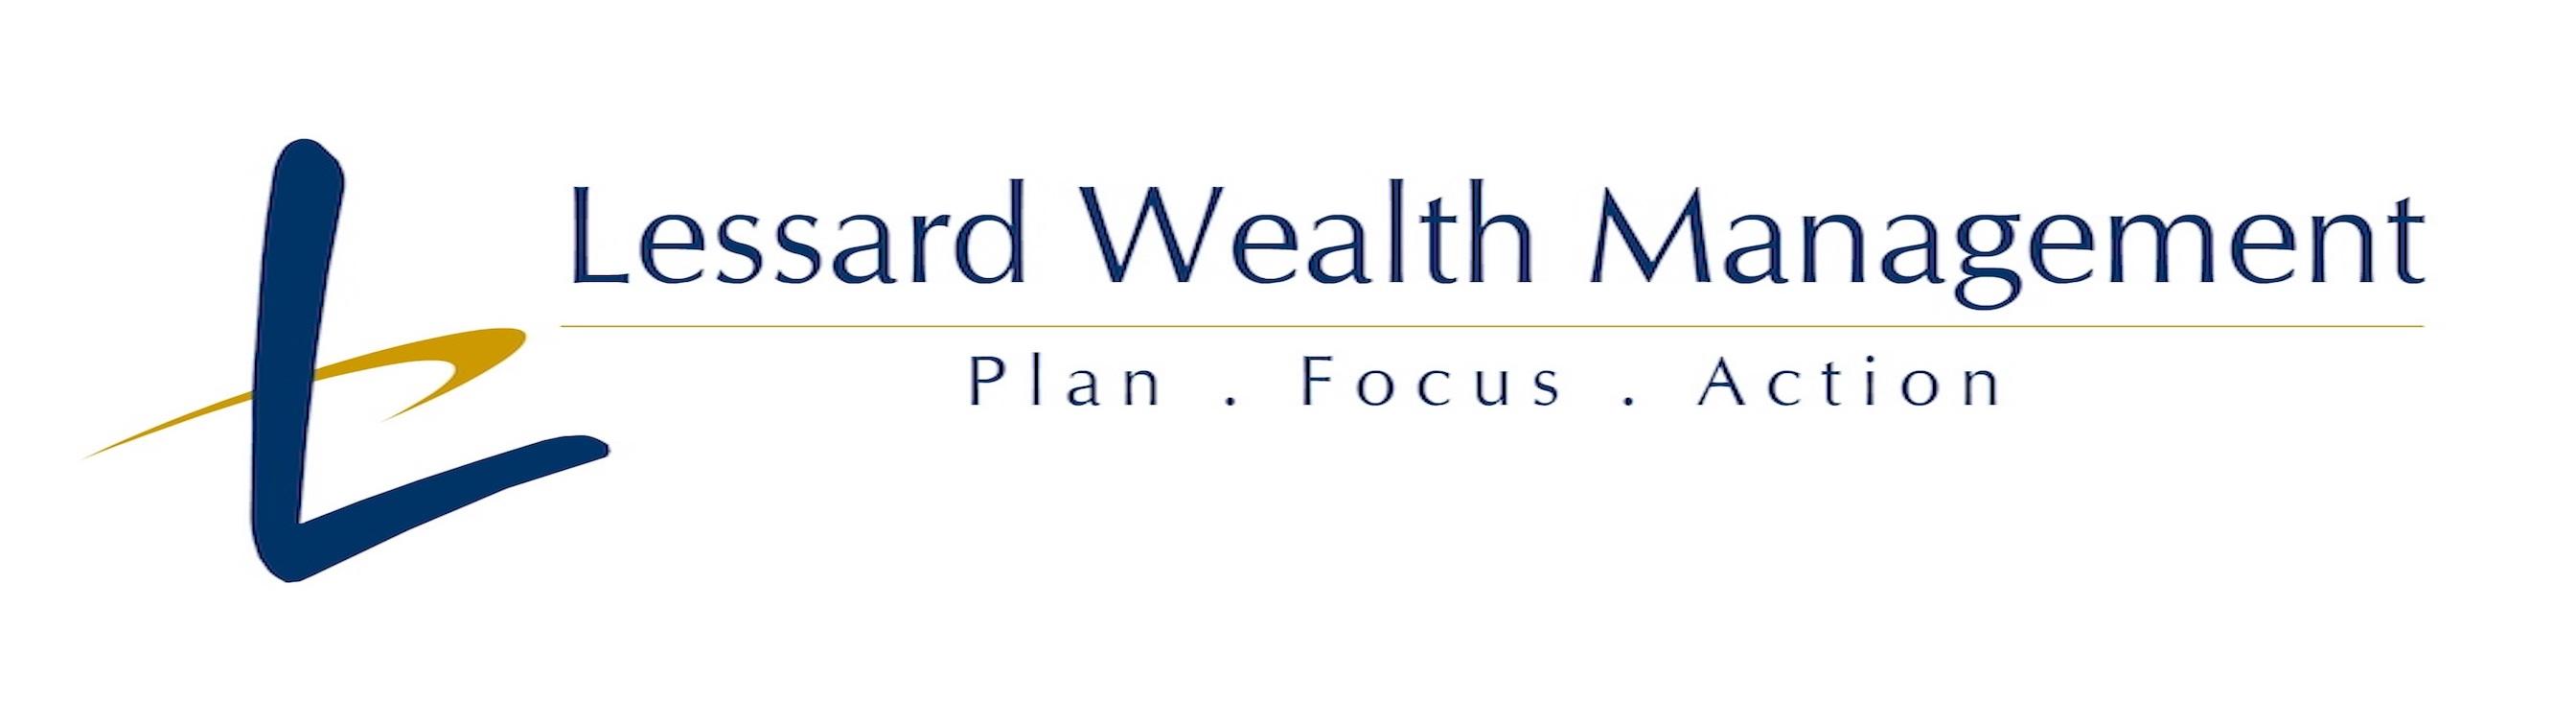 Lessard Wealth Management